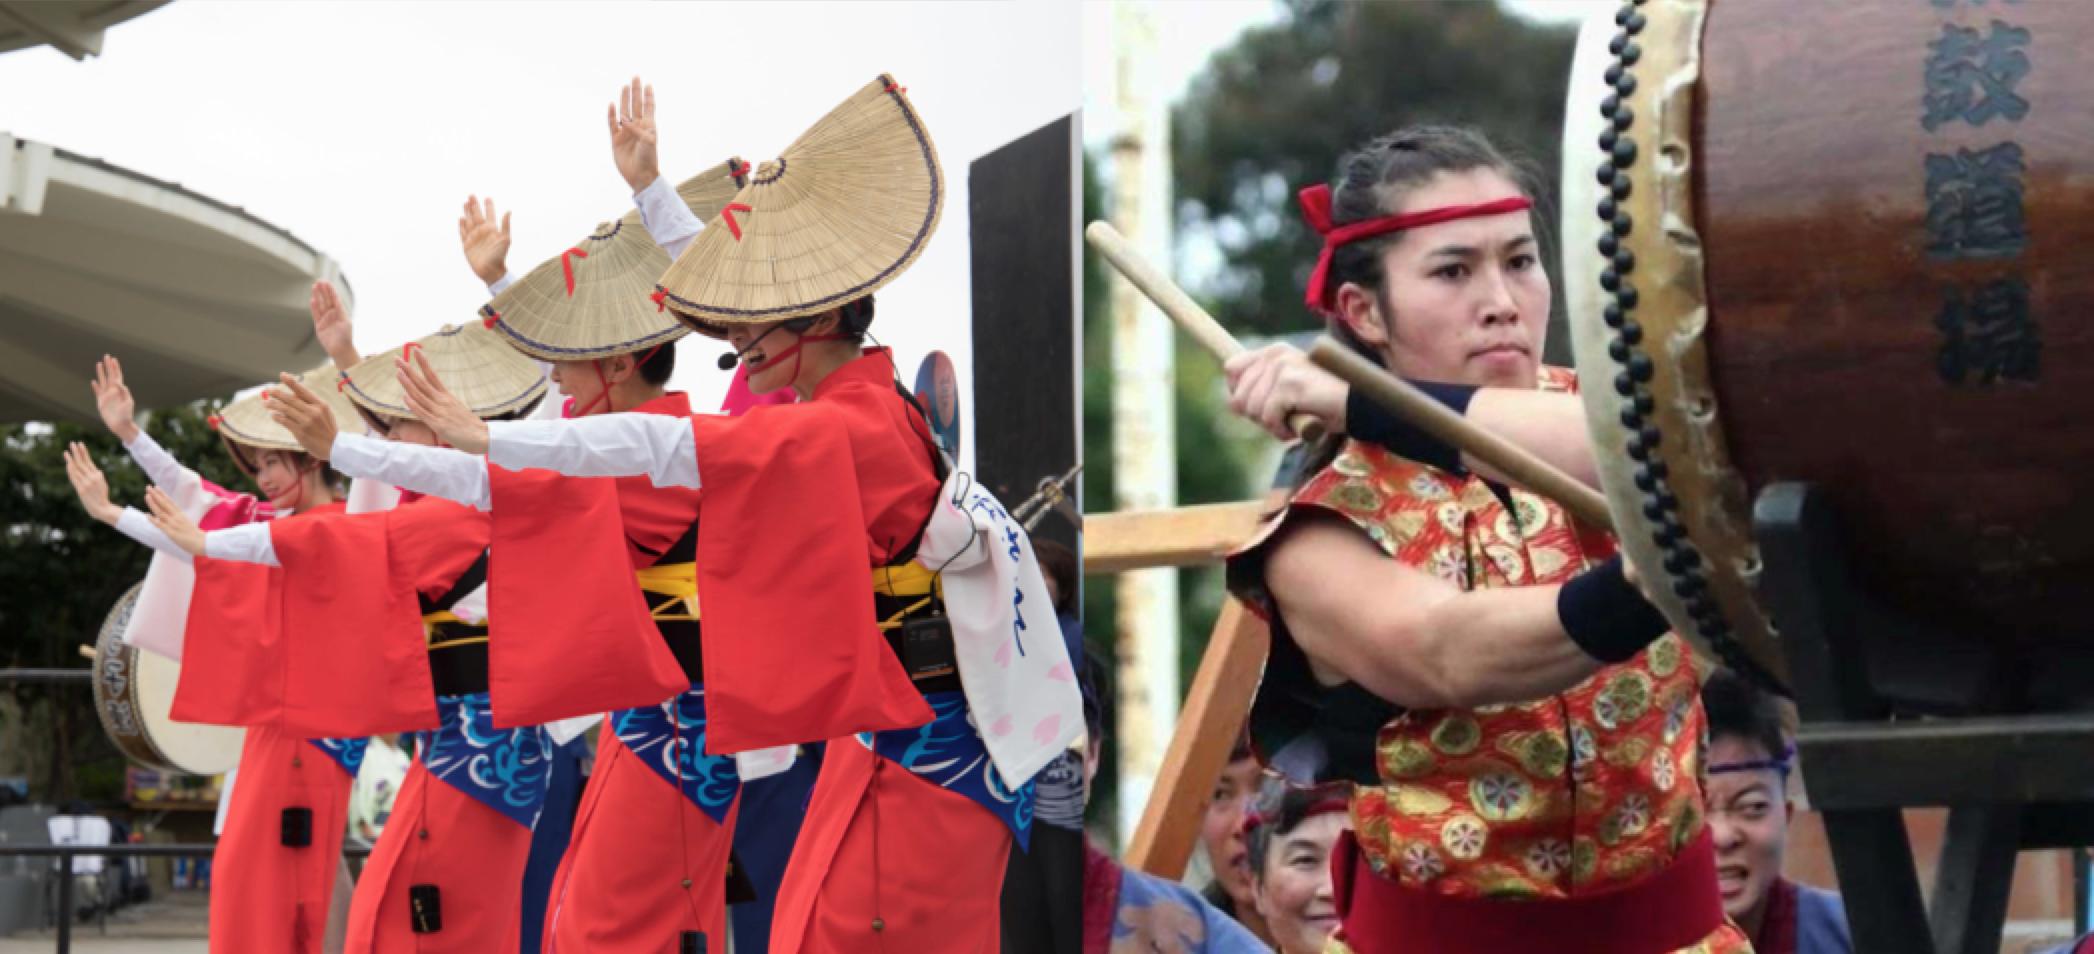 Nihonmachi Street Fair 2020.Japanese Summer Festivals Across The United States July